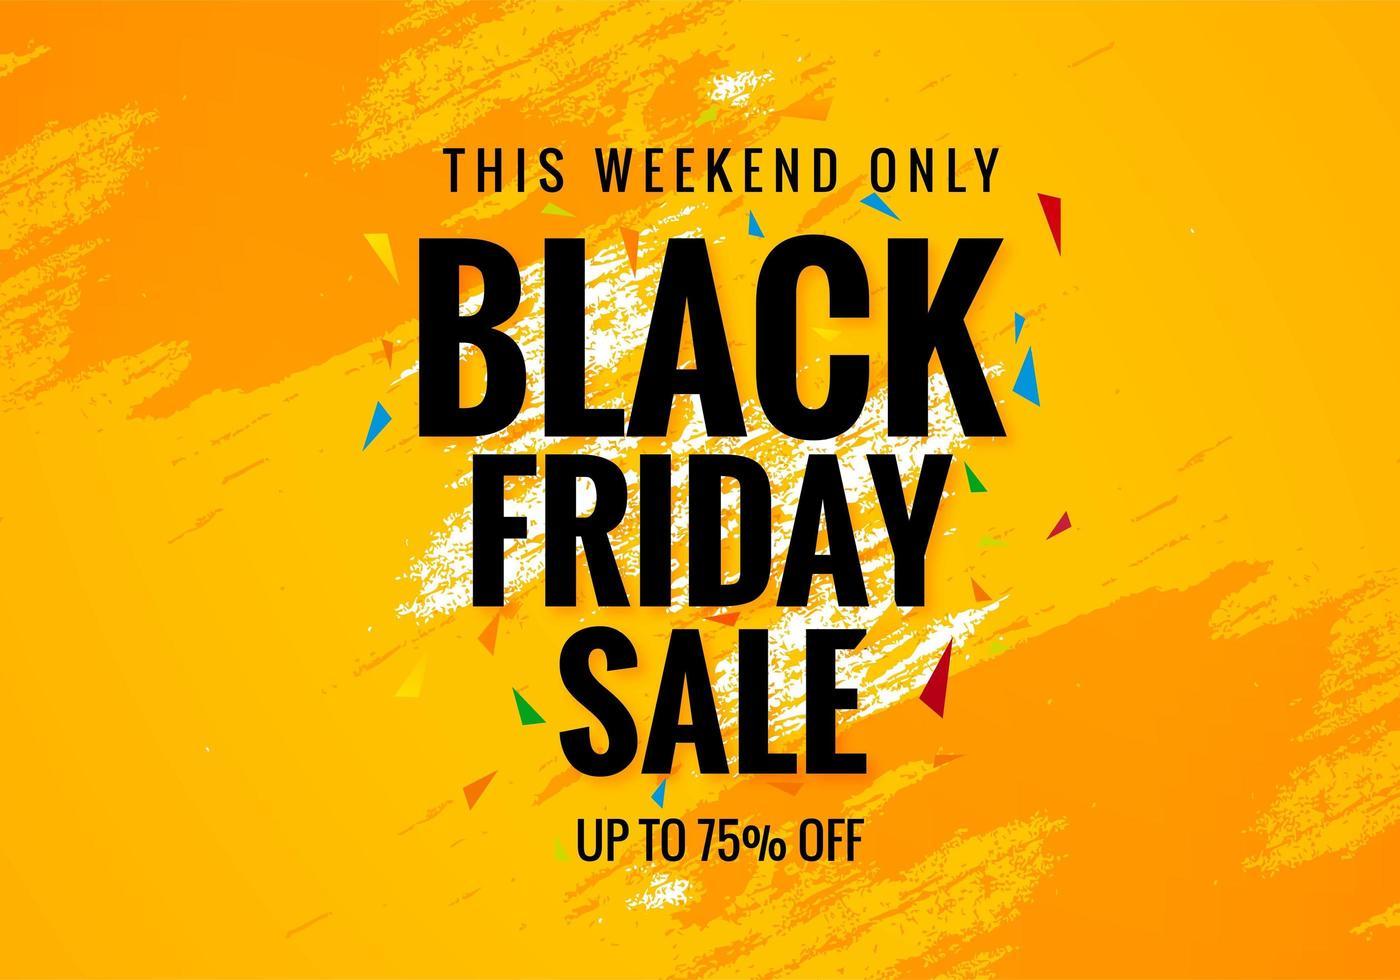 Black Friday Weekend Sale Poster Banner Background vector